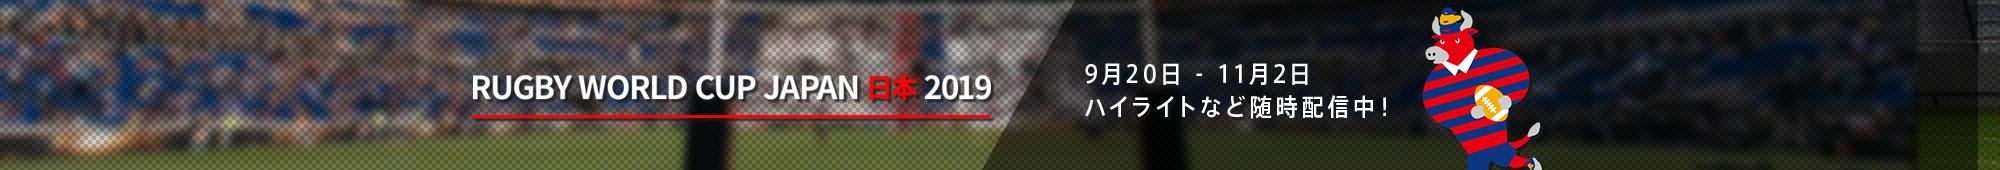 「SEINANラグビーマガジンCUP 関東ミニ・ラグビー交流大会2018」の出場申し込み受付を、6月14日で締め切らせていただきました。今年もたくさんのご応募をいただきありがとう…